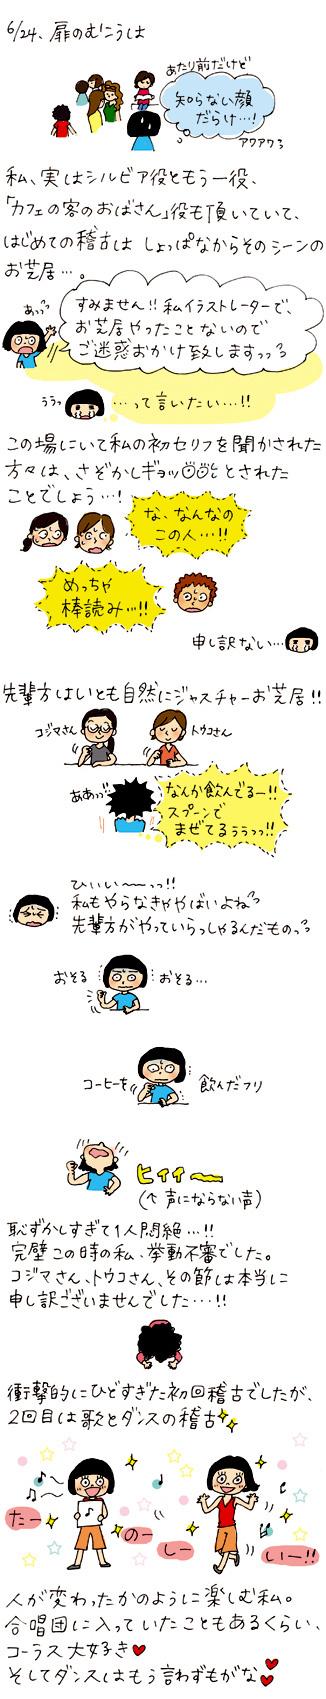 yuka8a_2.jpg